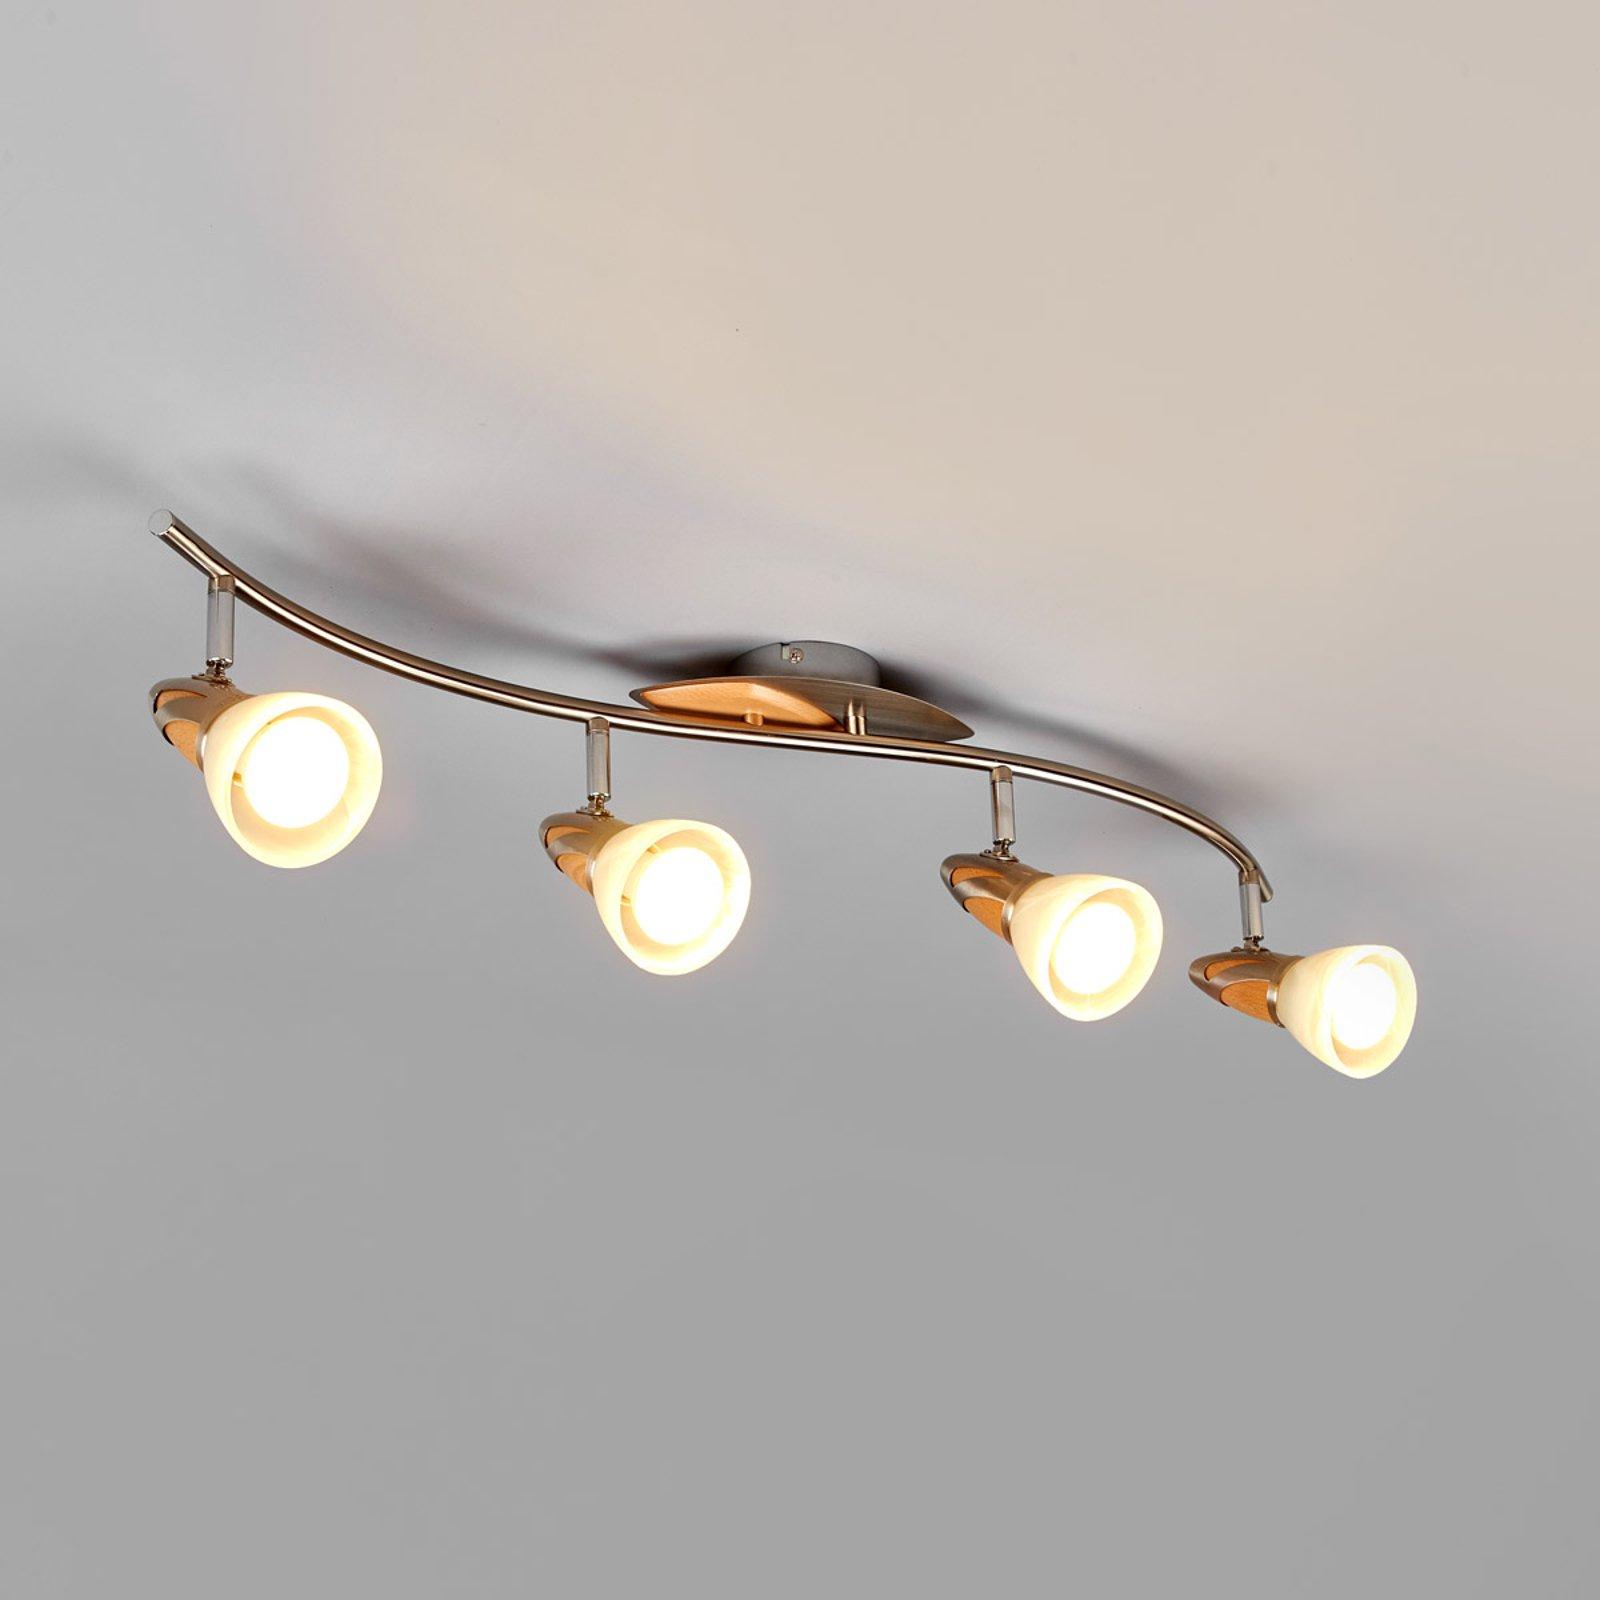 Taklampe Marena med fire lys, E14 LED-lys